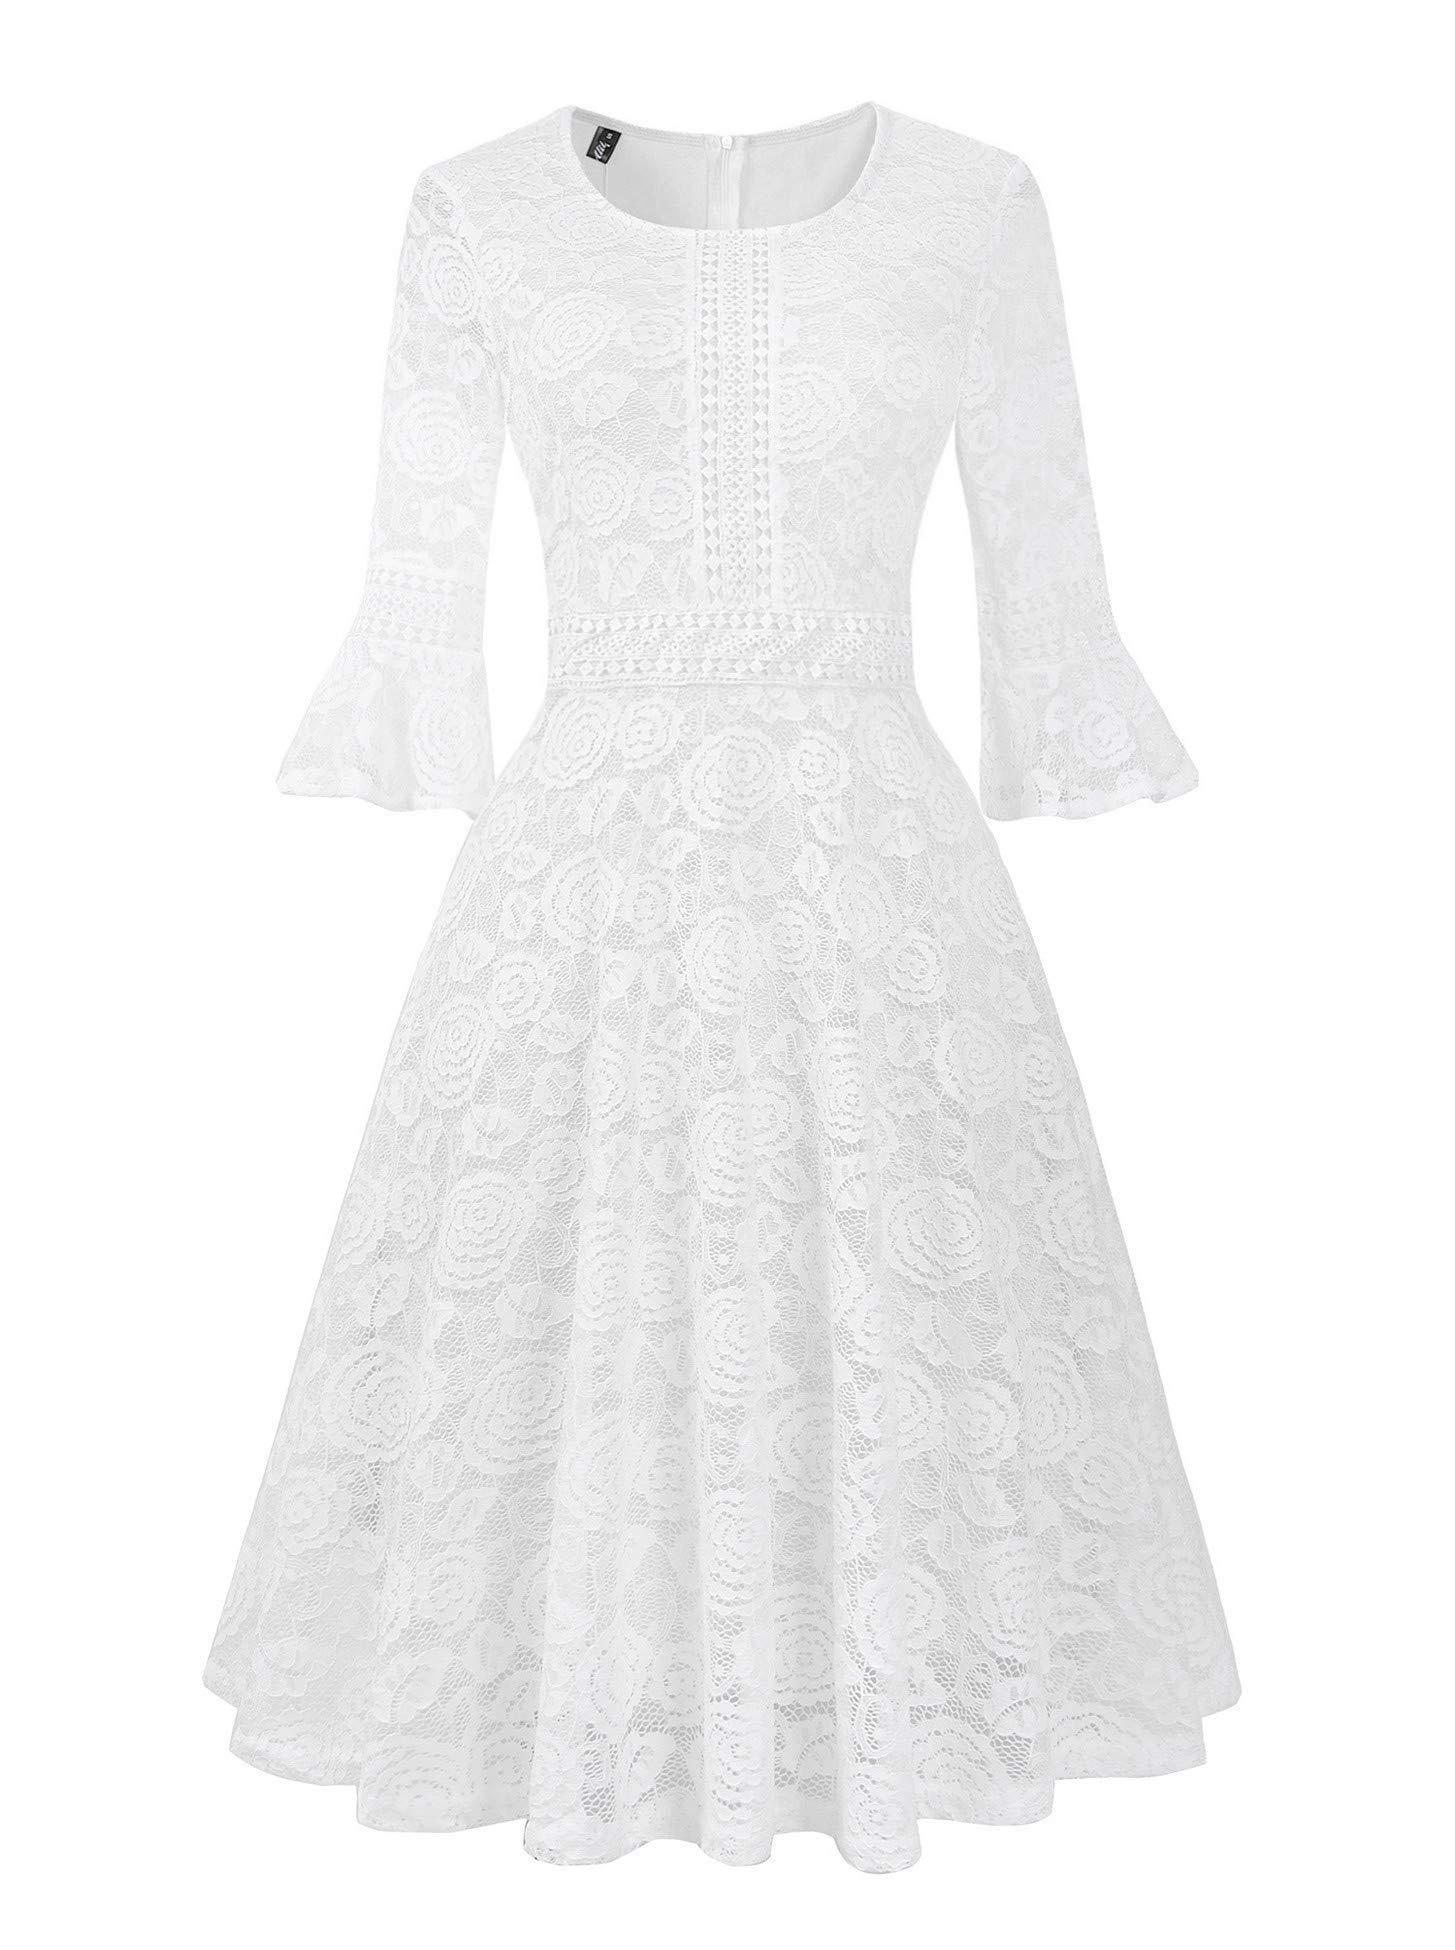 White Dress - Women's Elegant V Neck Wrap Knit Dresses Batwing Sleeve Backless Slit Maxi Dress With Belted